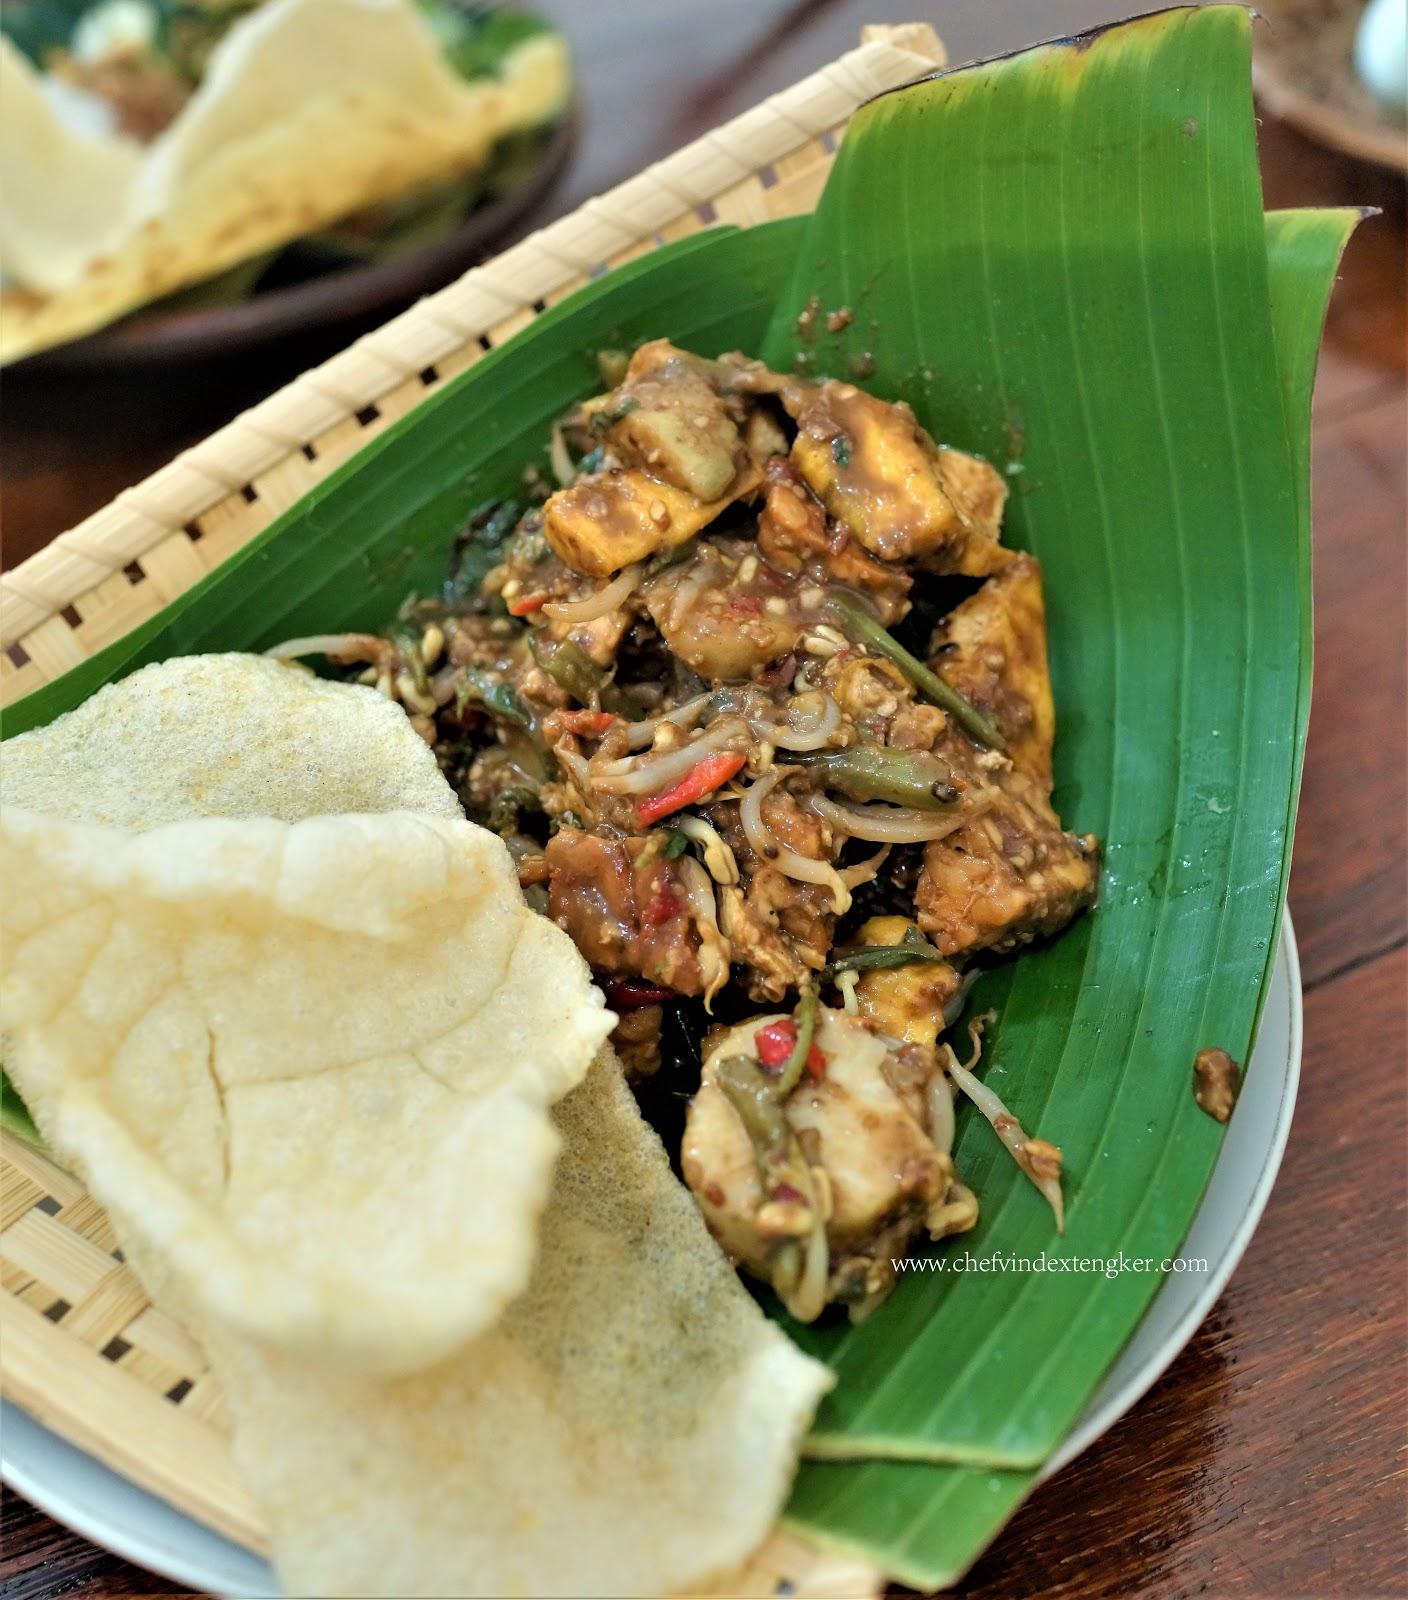 Rujak Cingur Jawa Timuran Chef Vindex Tengker